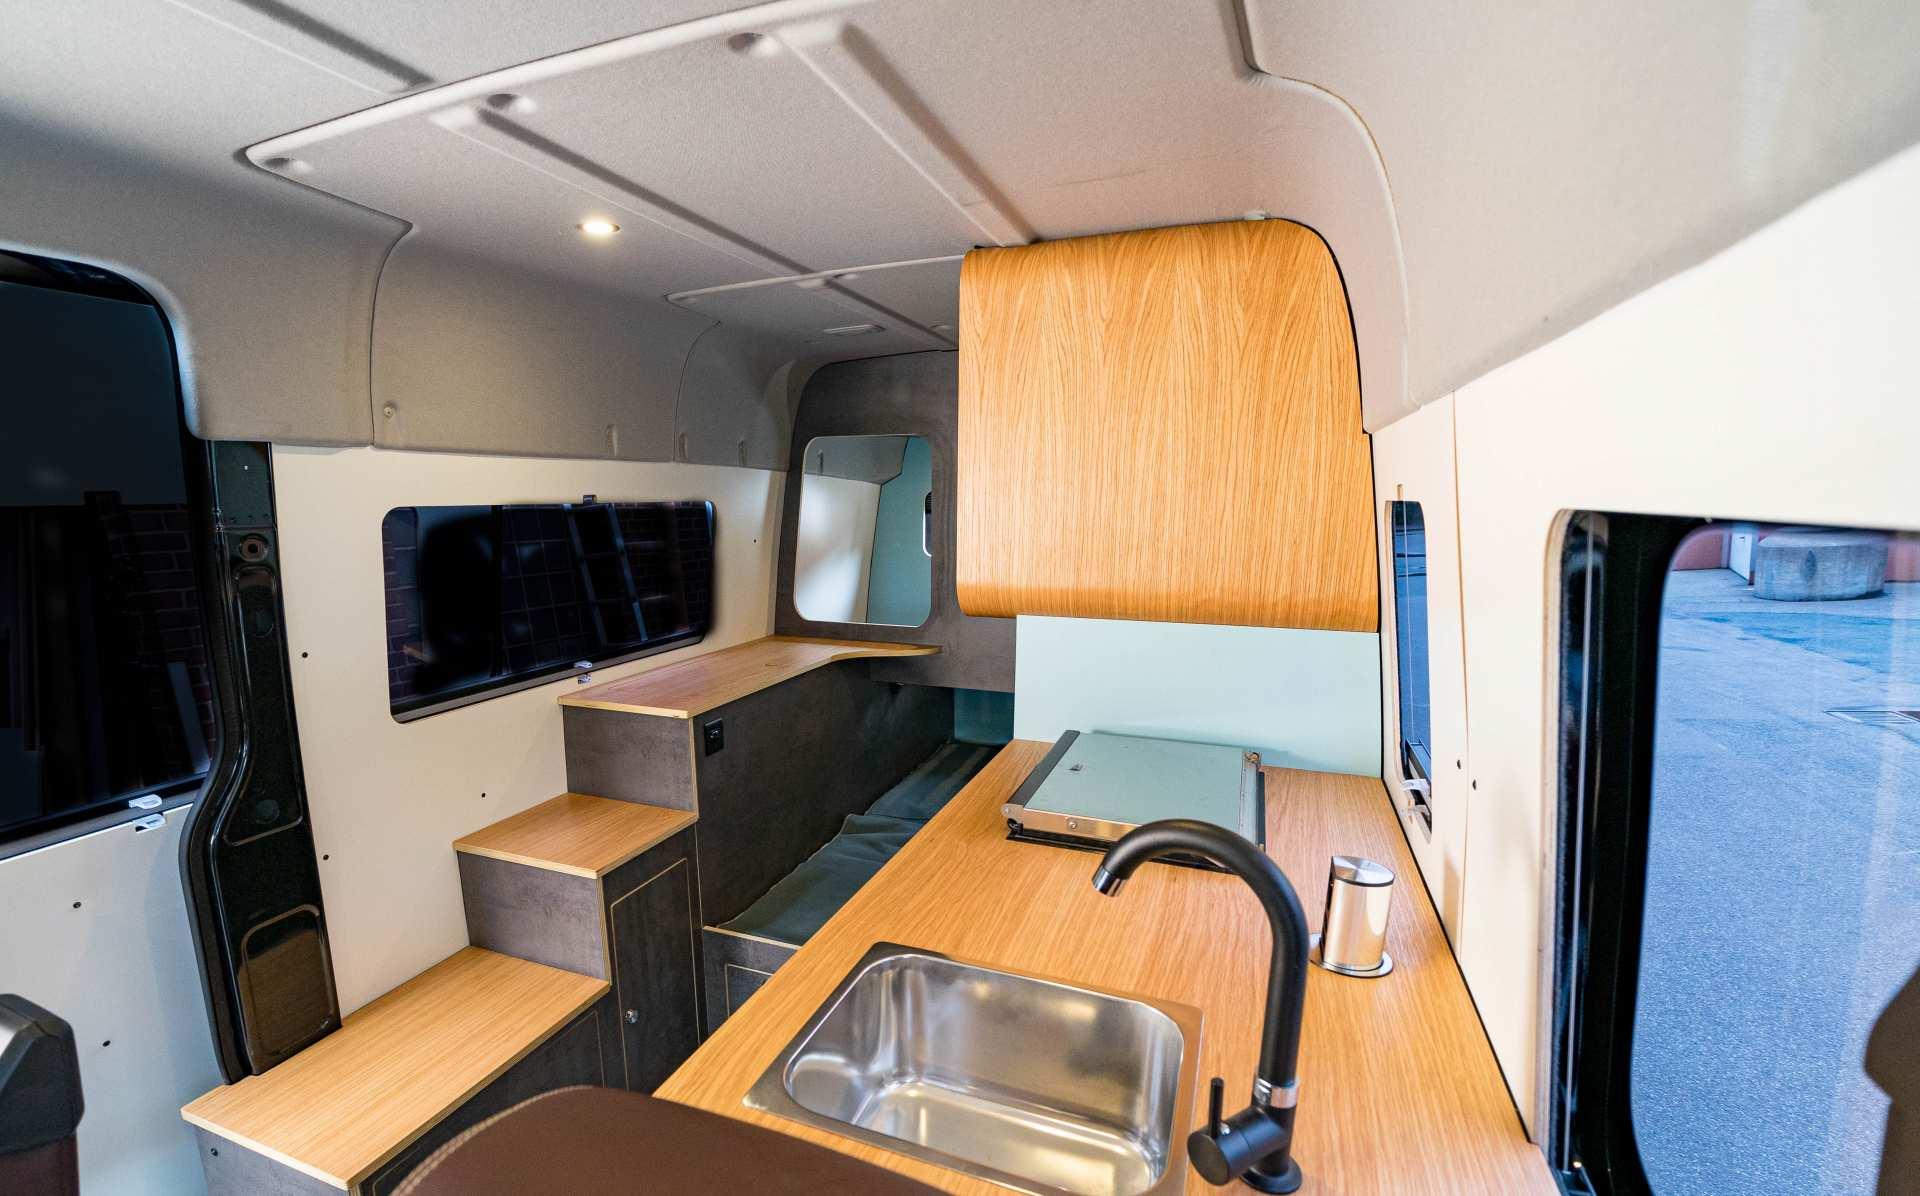 Individualausbau: Full House VW Crafter - 13